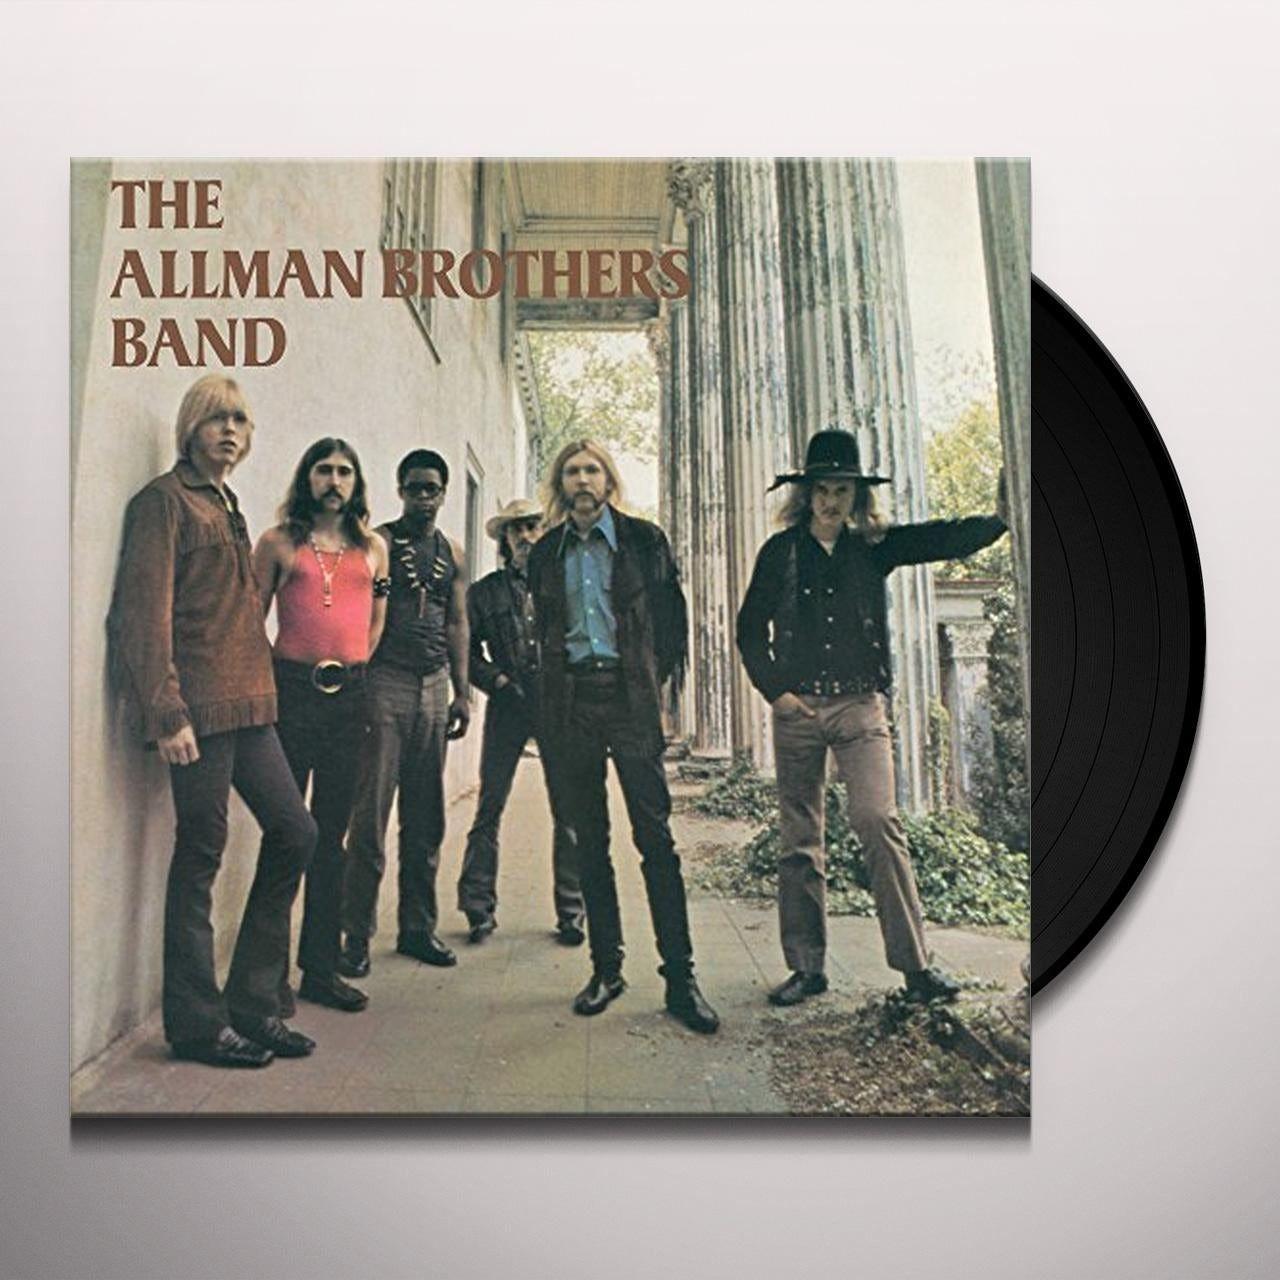 The Allman Brothers Band Vinyl Record Allman Brothers Band Allman Brothers Vinyl Records